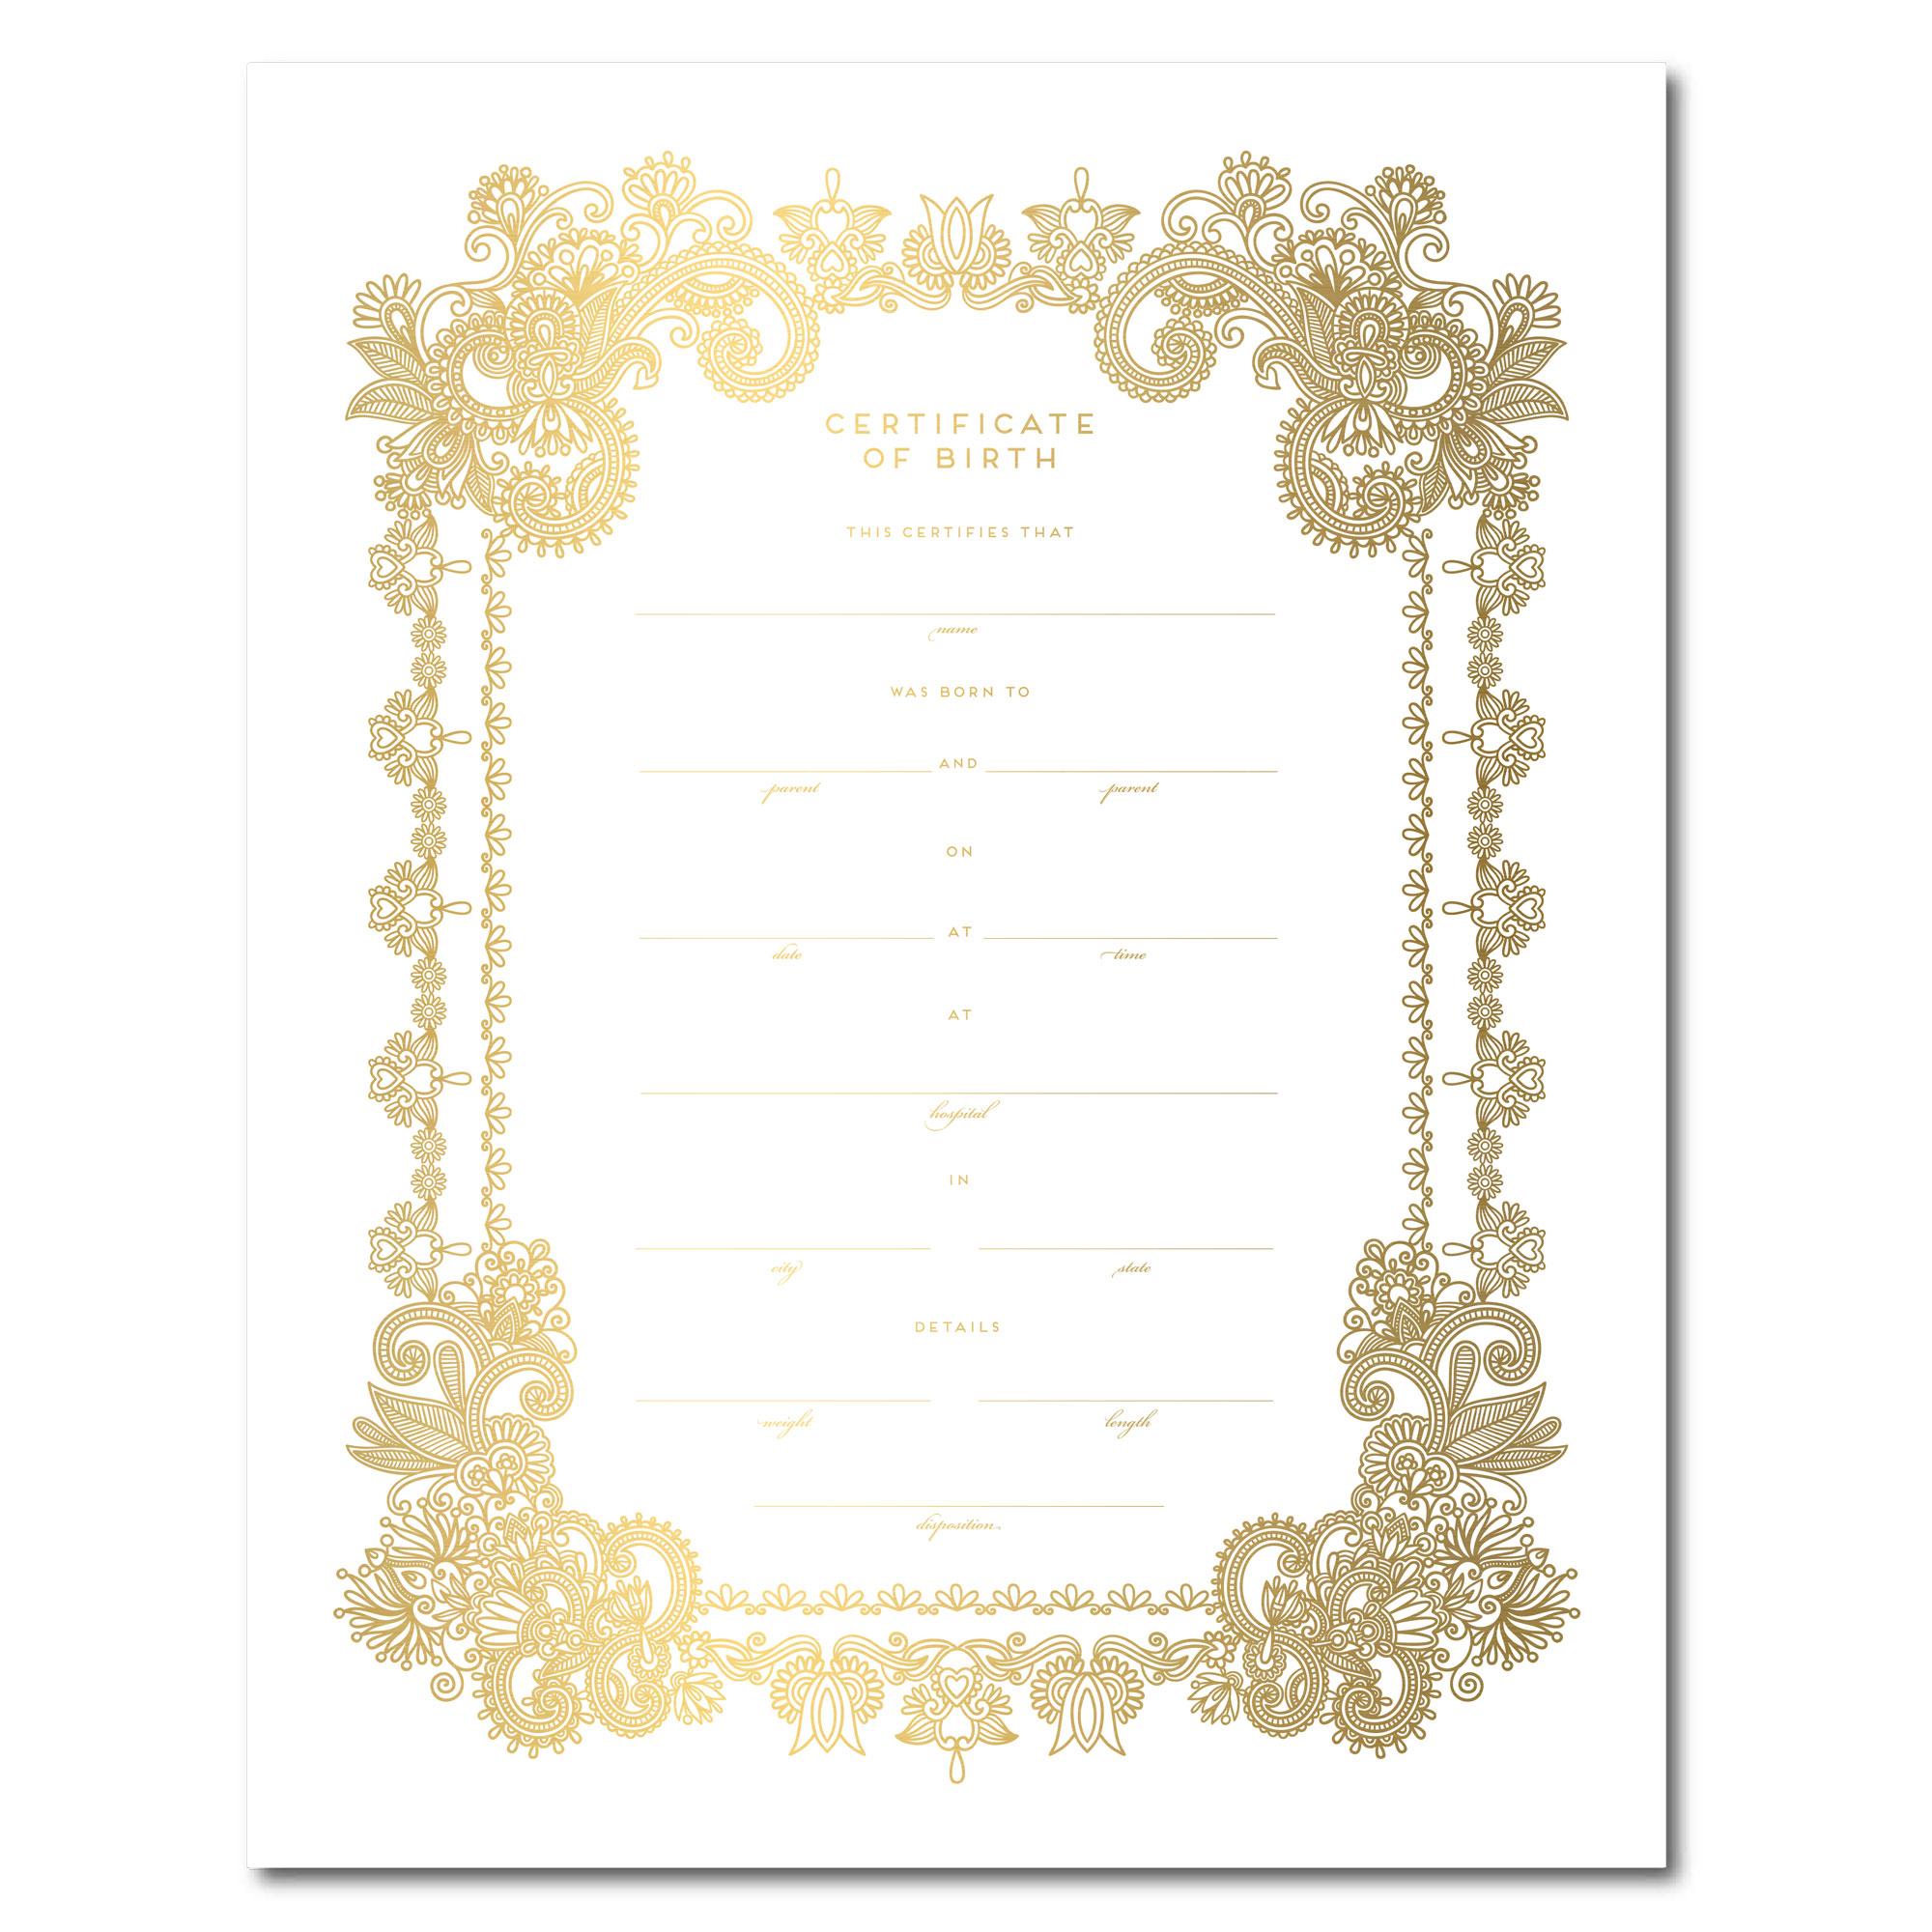 CertificateBirthF.jpg